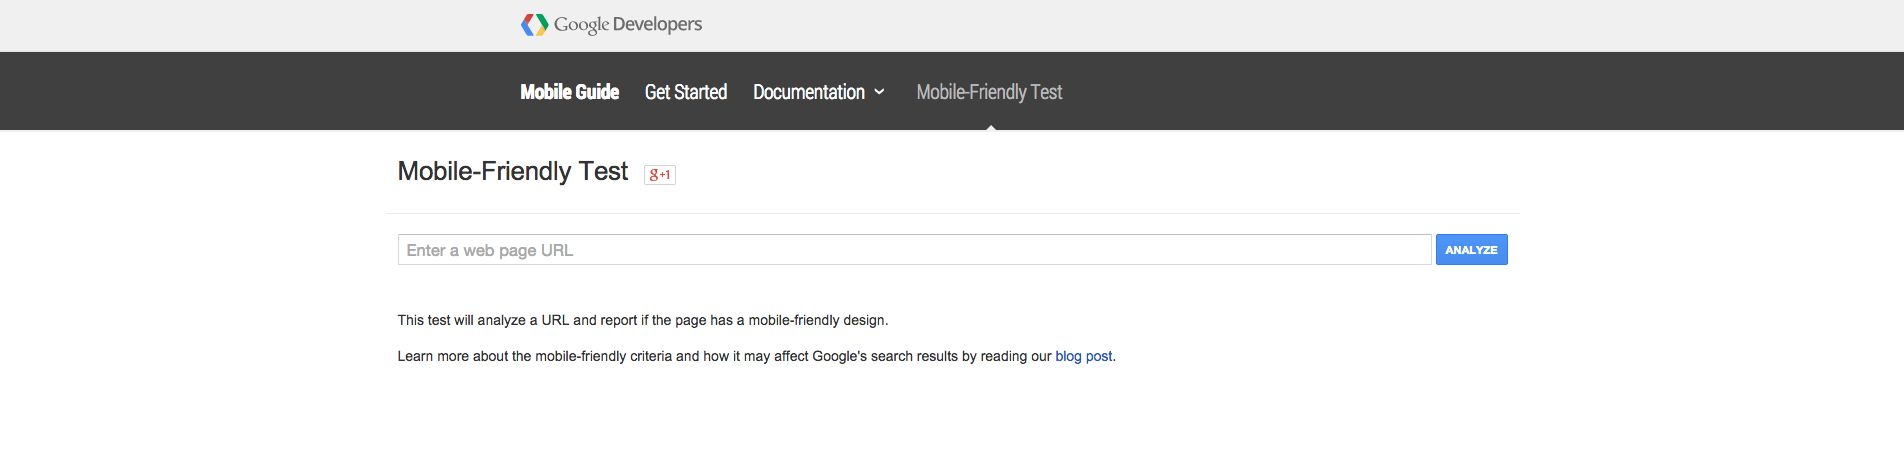 Mobile Usability Testing Tool - Google